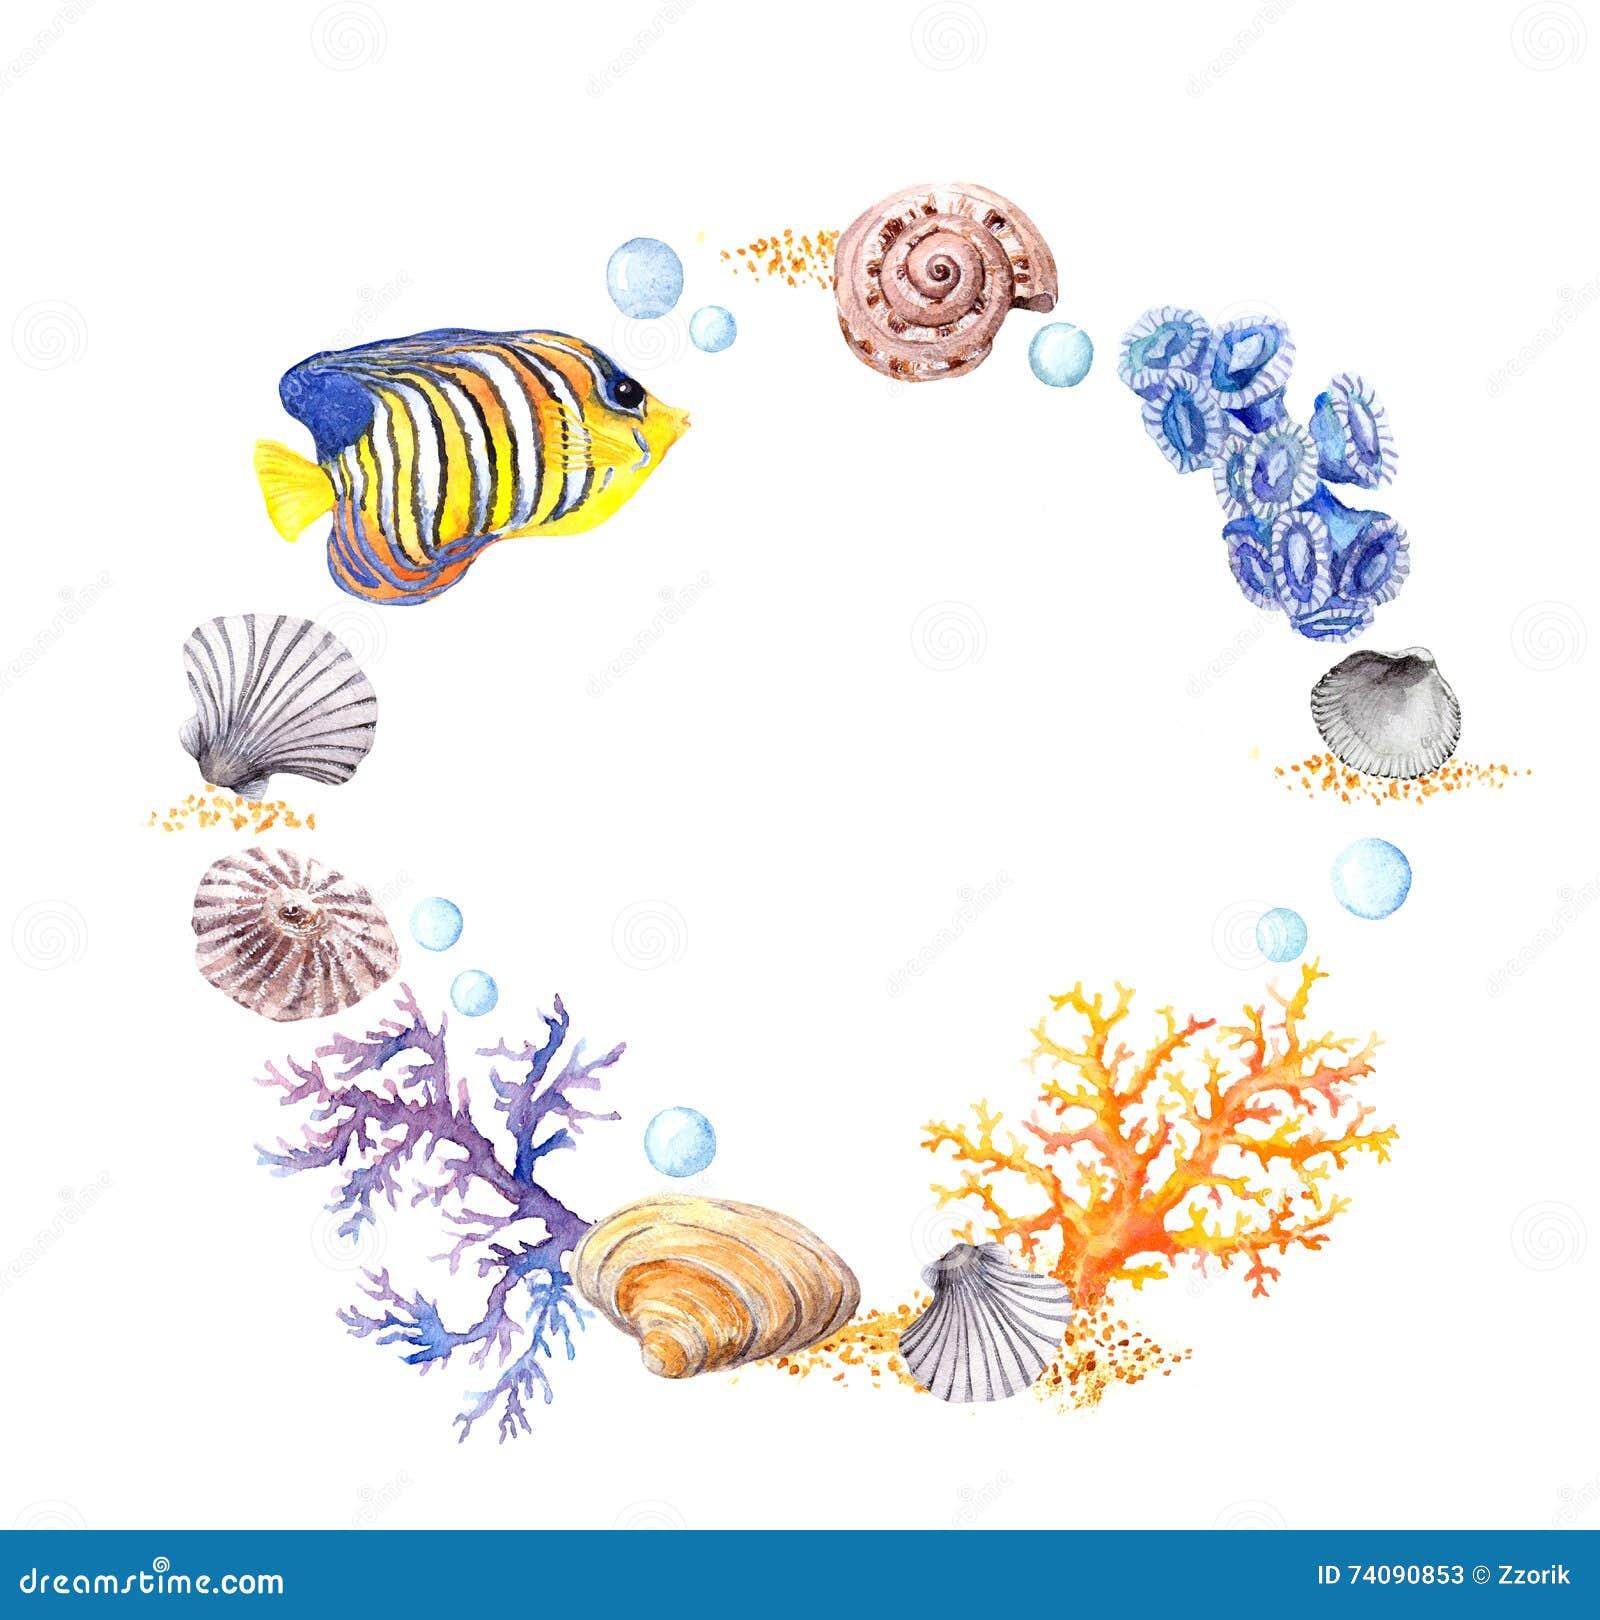 sea shell  coral  sand summer beach wreath border seaweed vector images seaweed illustration vector